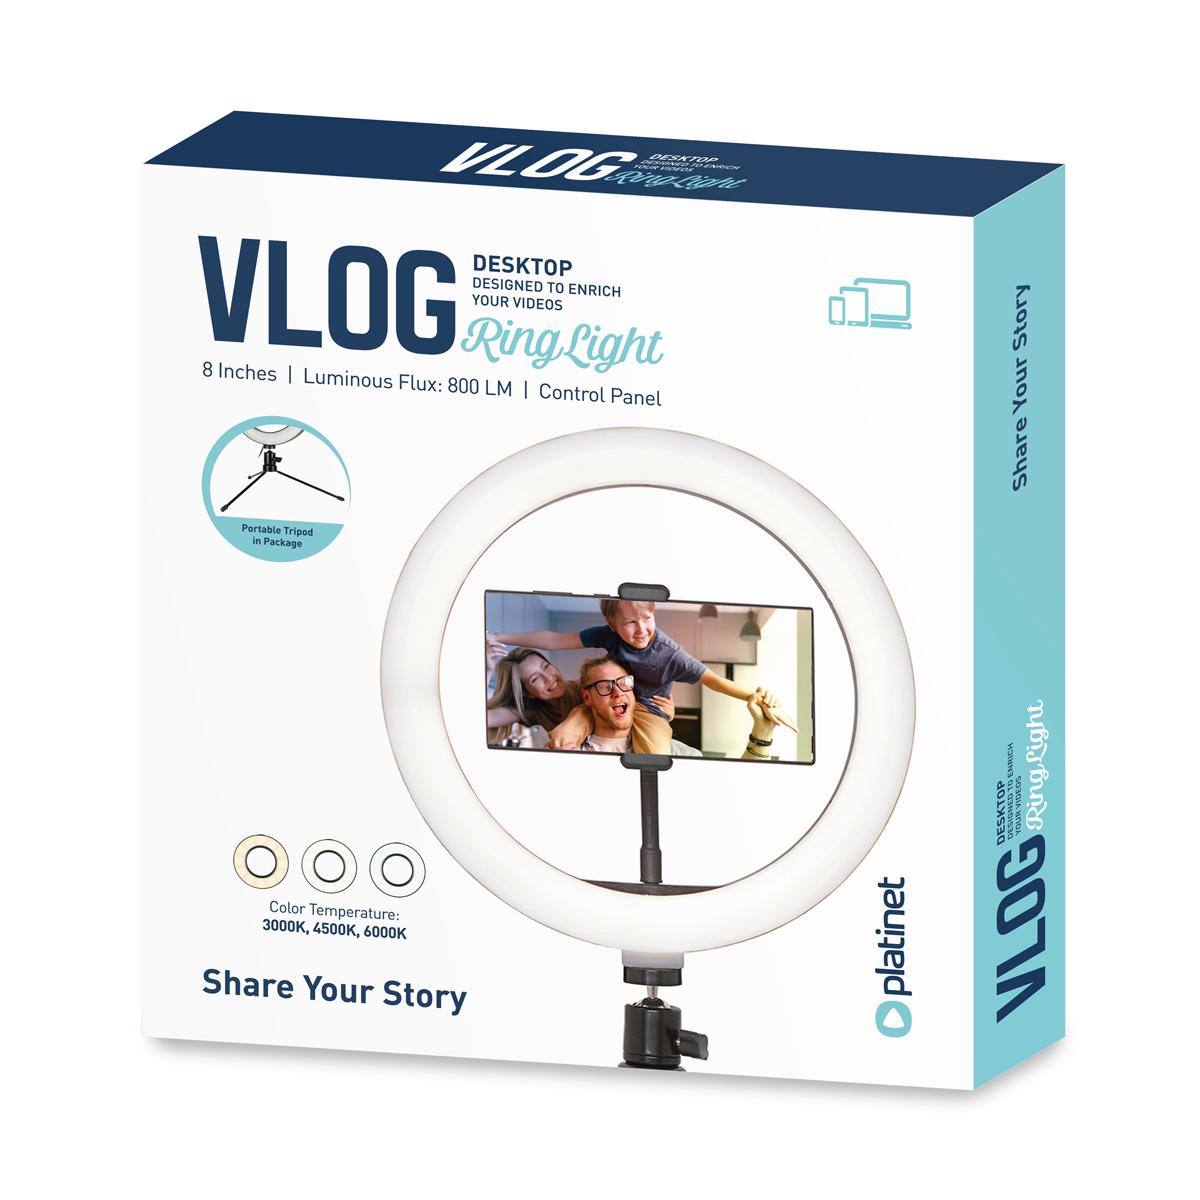 Platinet 8 inch Vlog LED ringlamp (72 LEDs) op driepoot 14,5 cm, inclusief phone holder - 3000K-4500K-6000K instelbaar, 1,9m USB kabel met schakelaar inbegrepen